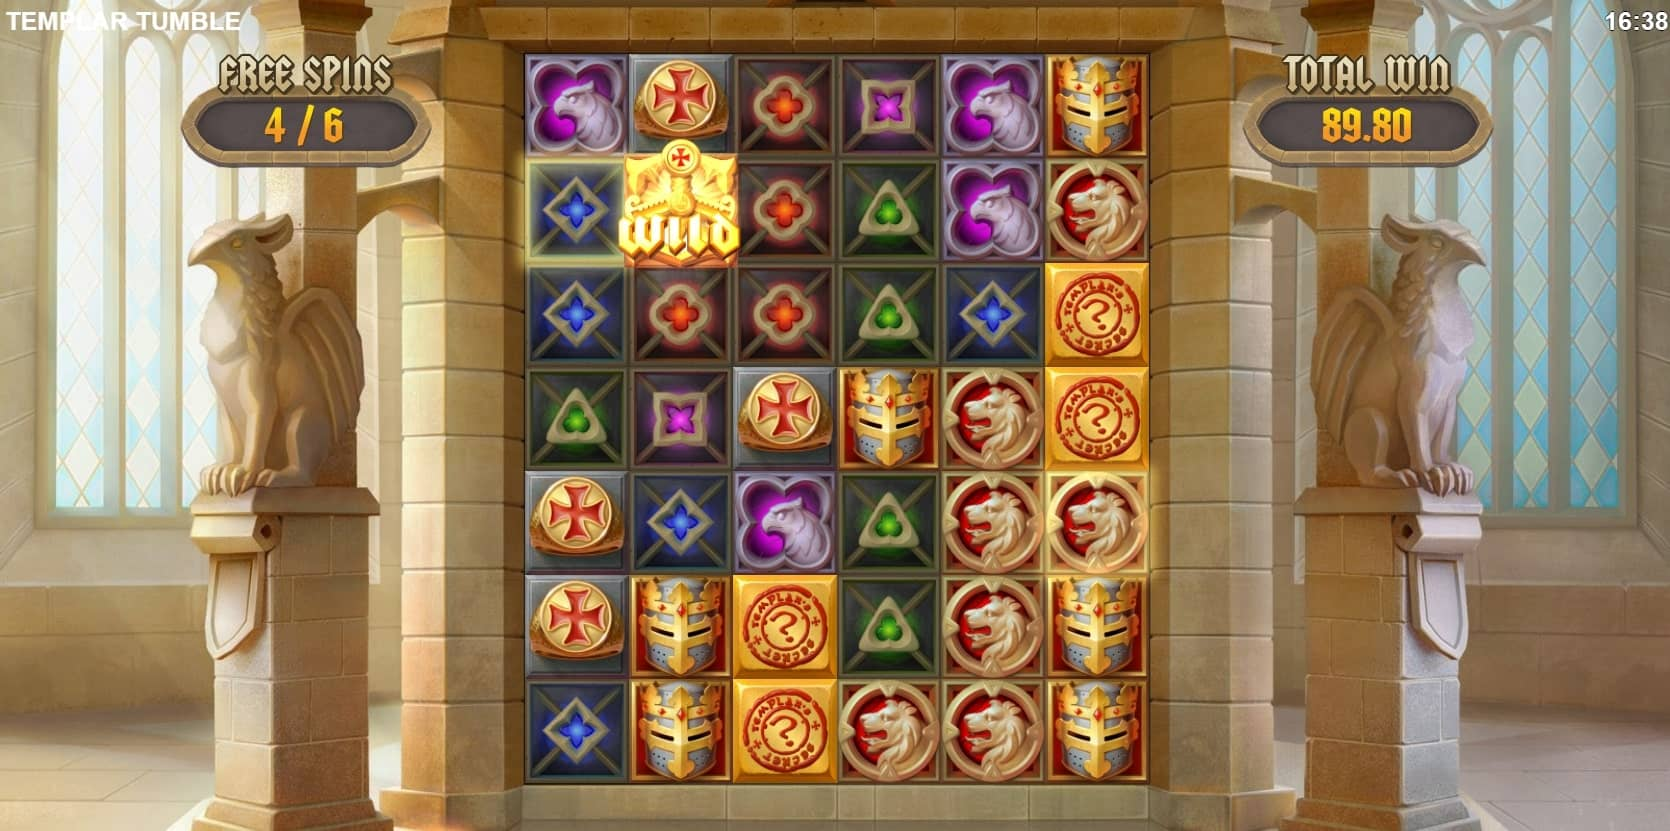 Templar Tumble Slot Free Spins